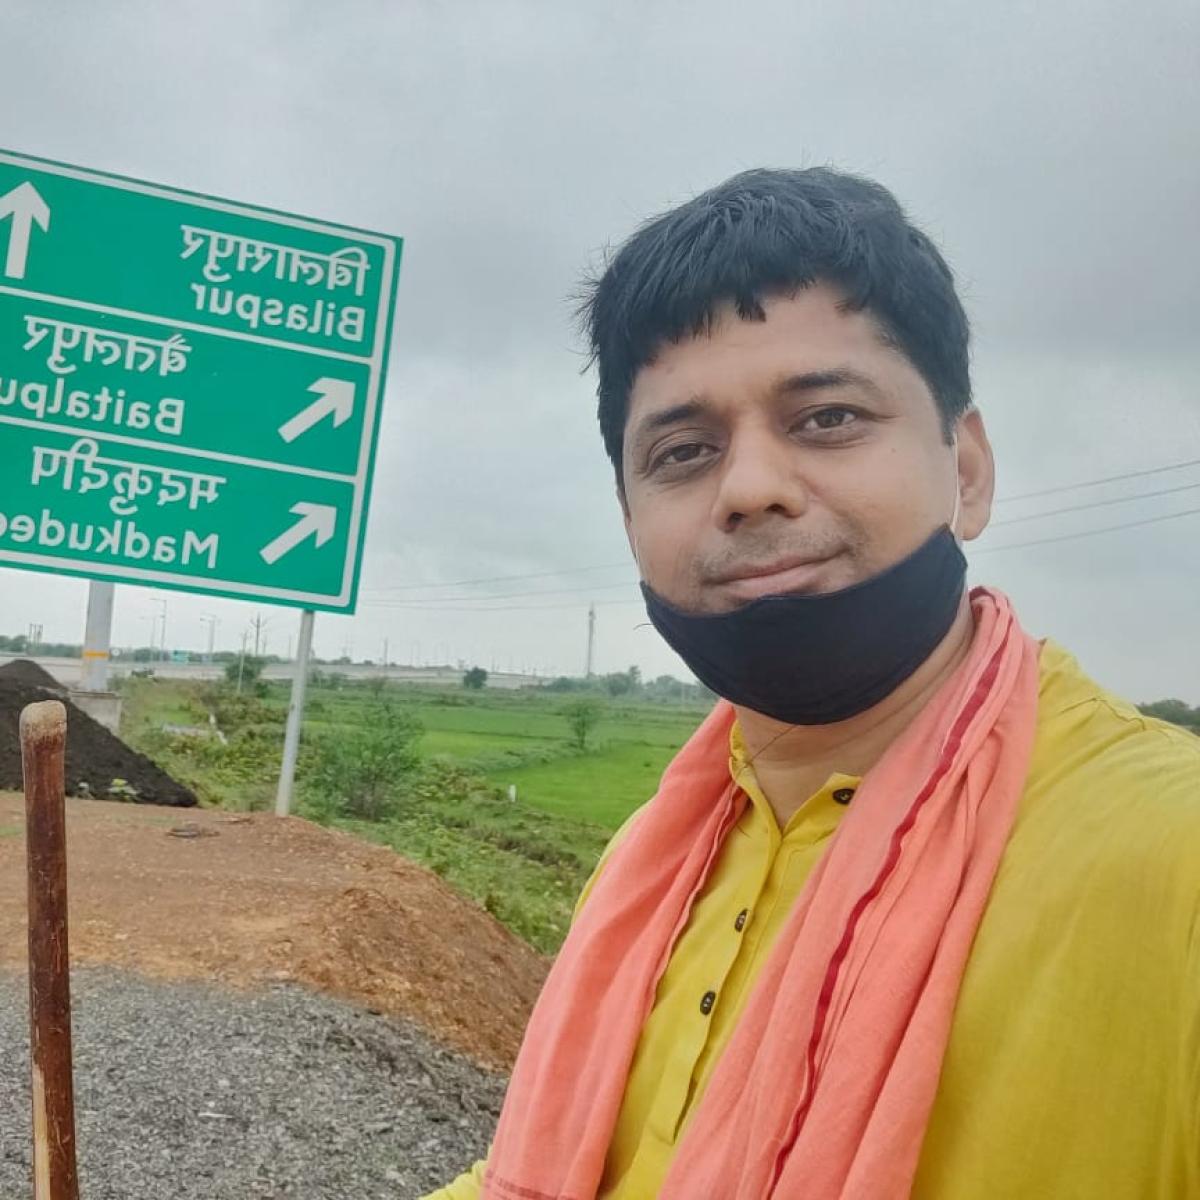 Meet RSS worker Muhammed Faiz Khan who is walking 750 km to attend Ayodhya Ram Mandir foundation